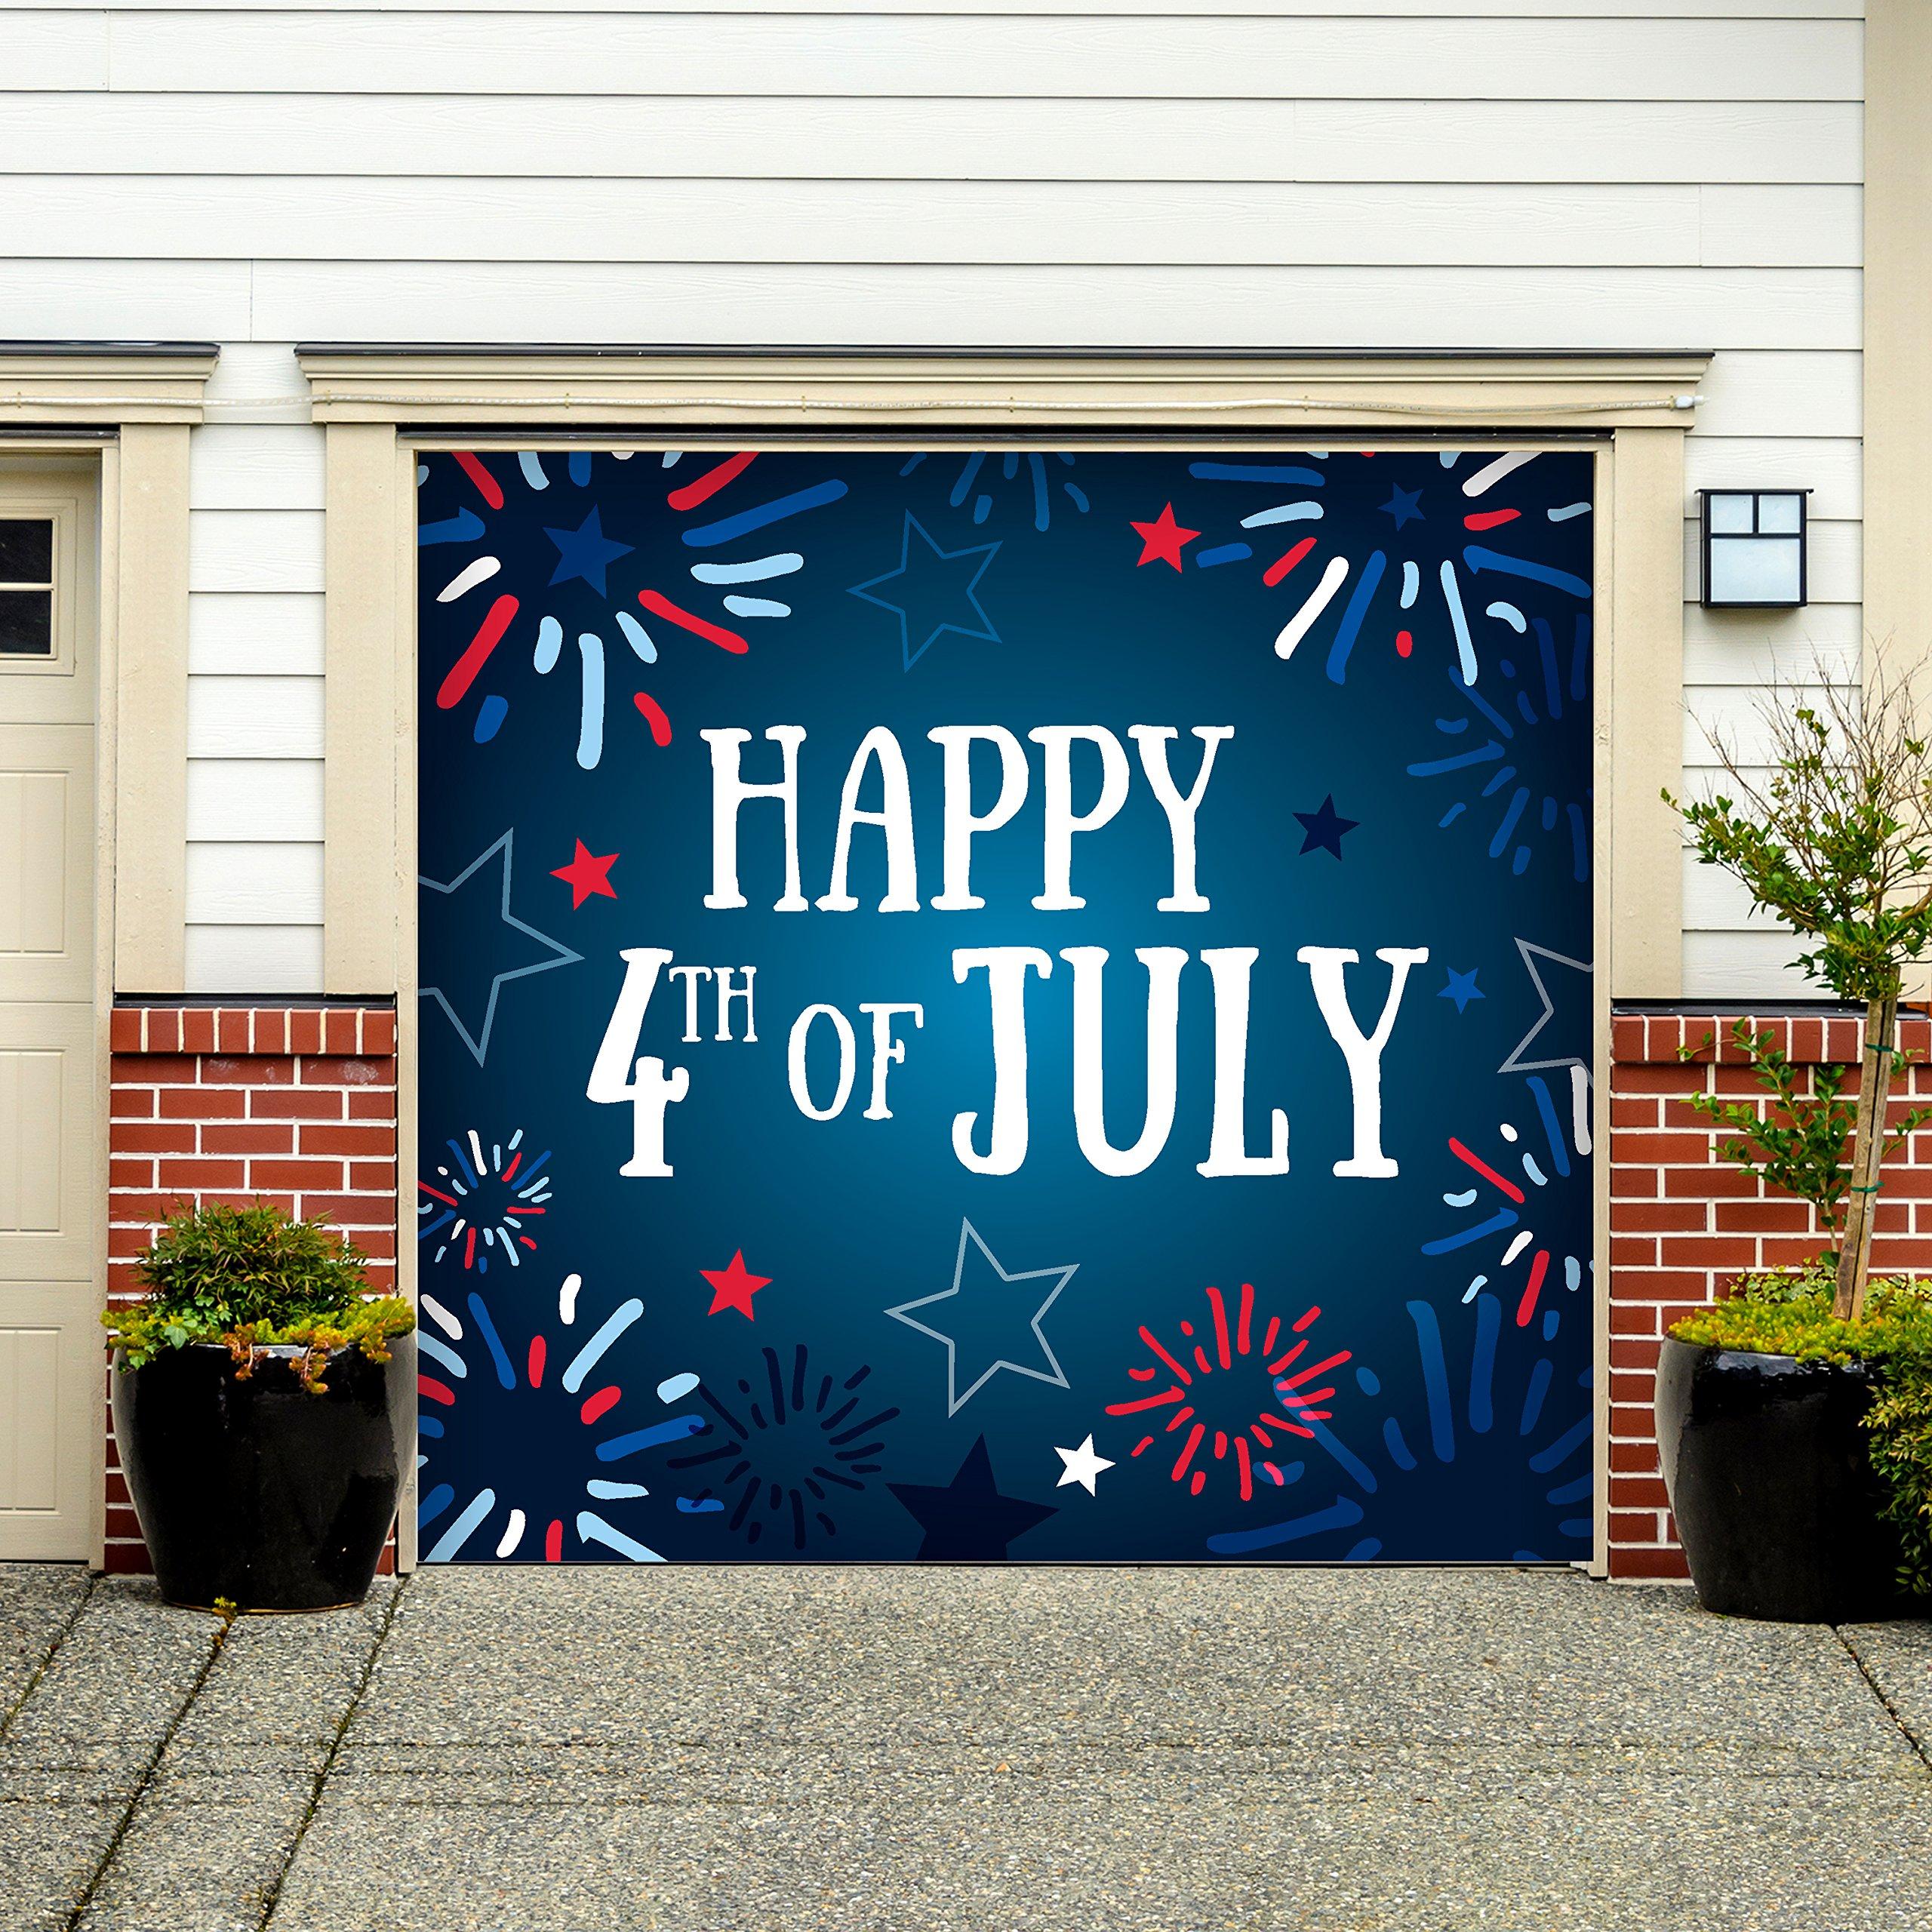 Outdoor Patriotic American Holiday Garage Door Banner Cover Mural Décoration - Fireworks Happy 4th of July - Outdoor American Holiday Garage Door Banner Décor Sign 7'x 8'